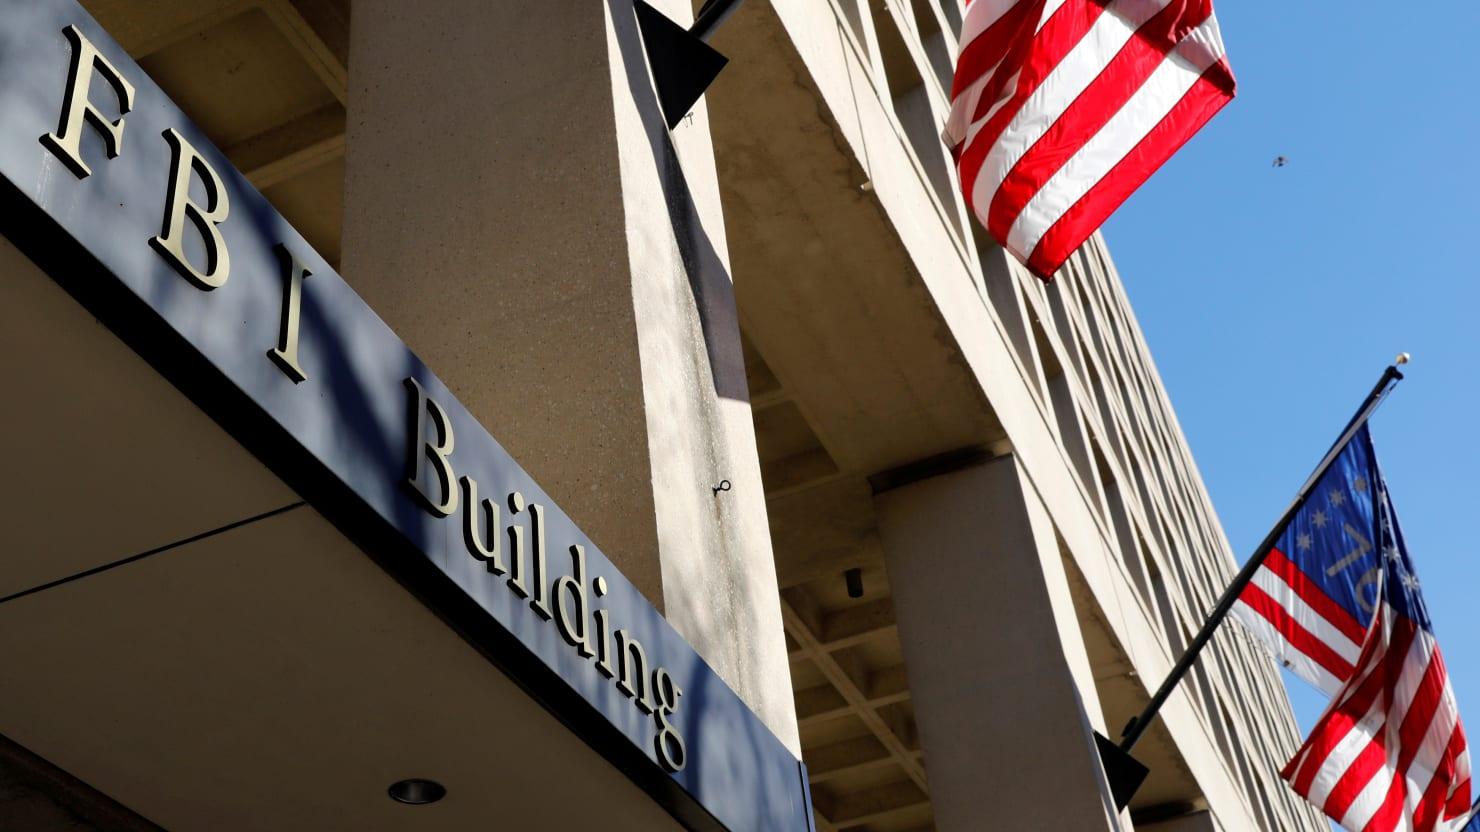 FBI Investigating Multiple Fake Explosives Placed Around Newburgh, New York